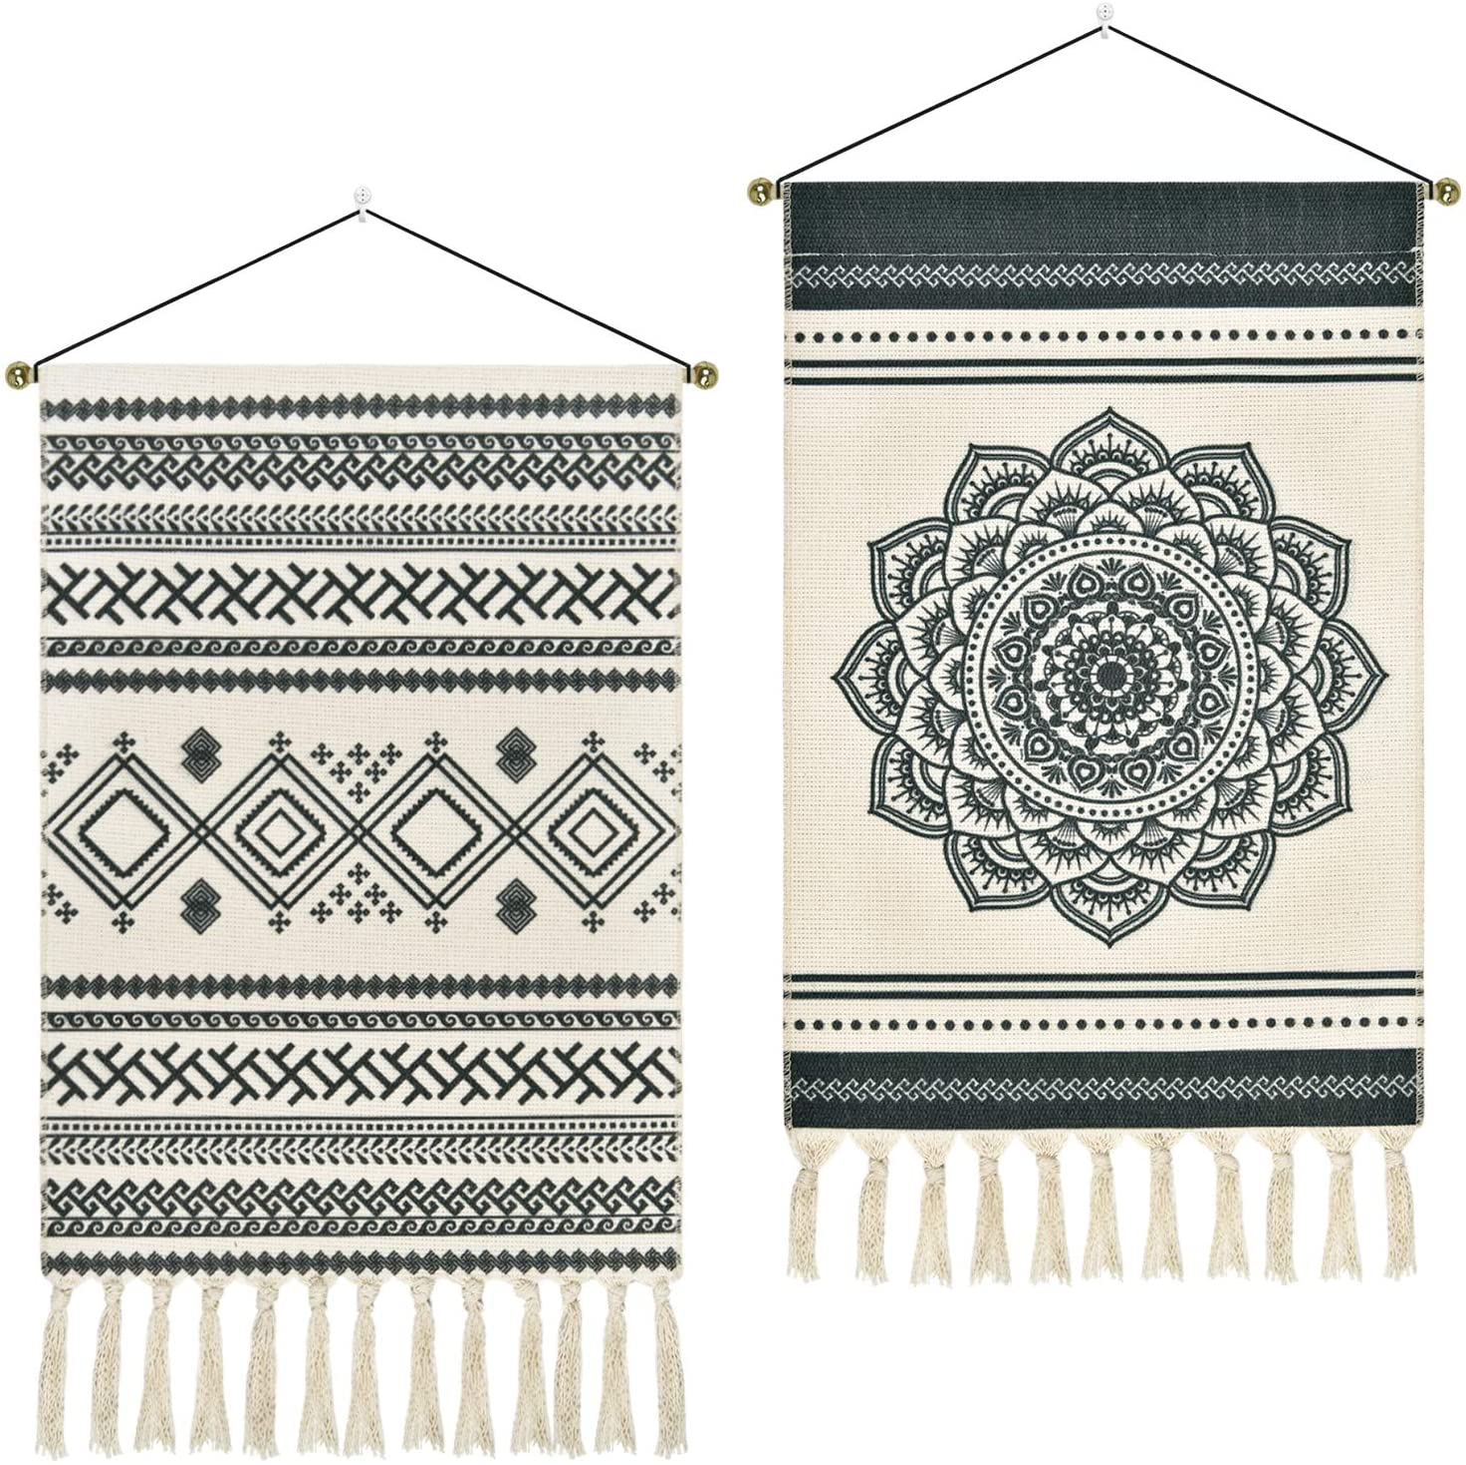 2 Pcs Macrame Woven Tapestry Bohemian Mandala Tapestries Geometric Art Tapestry Dark Gray Tapestry Wall Hanging for Apartment, Dorm Room